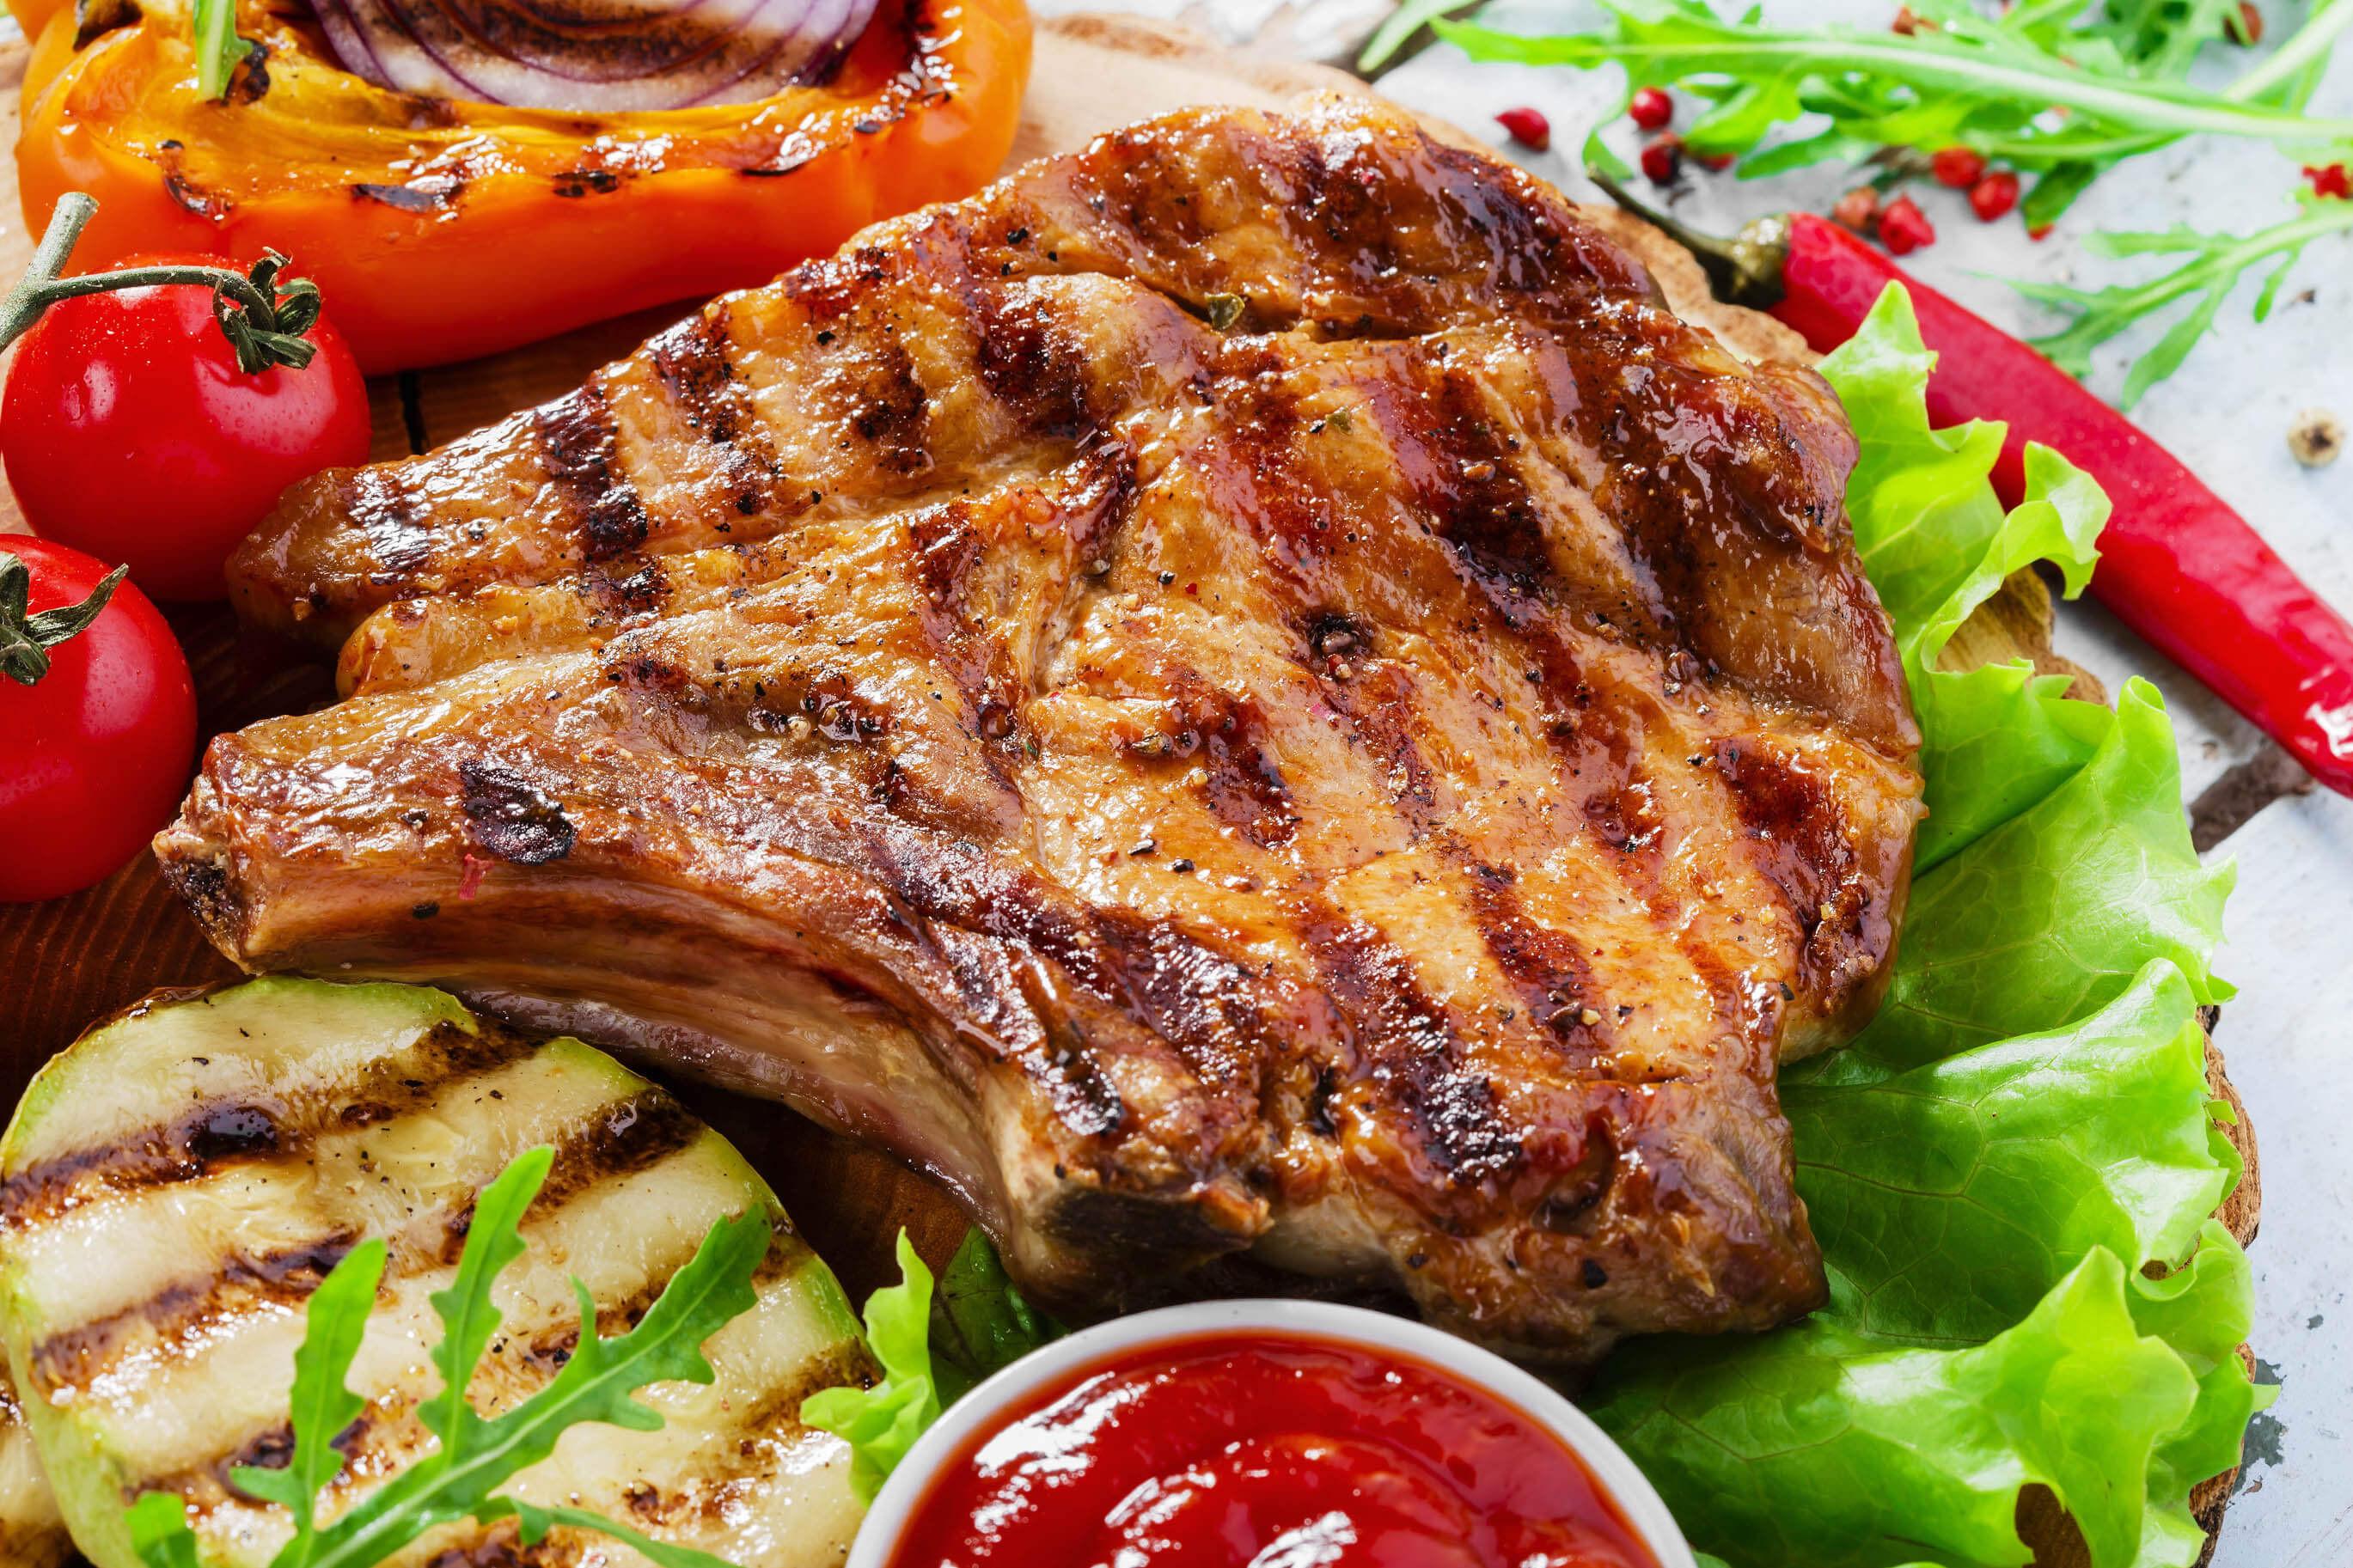 Heart Healthy Pork Chops  Genetic engineering could make pork heart healthy if not